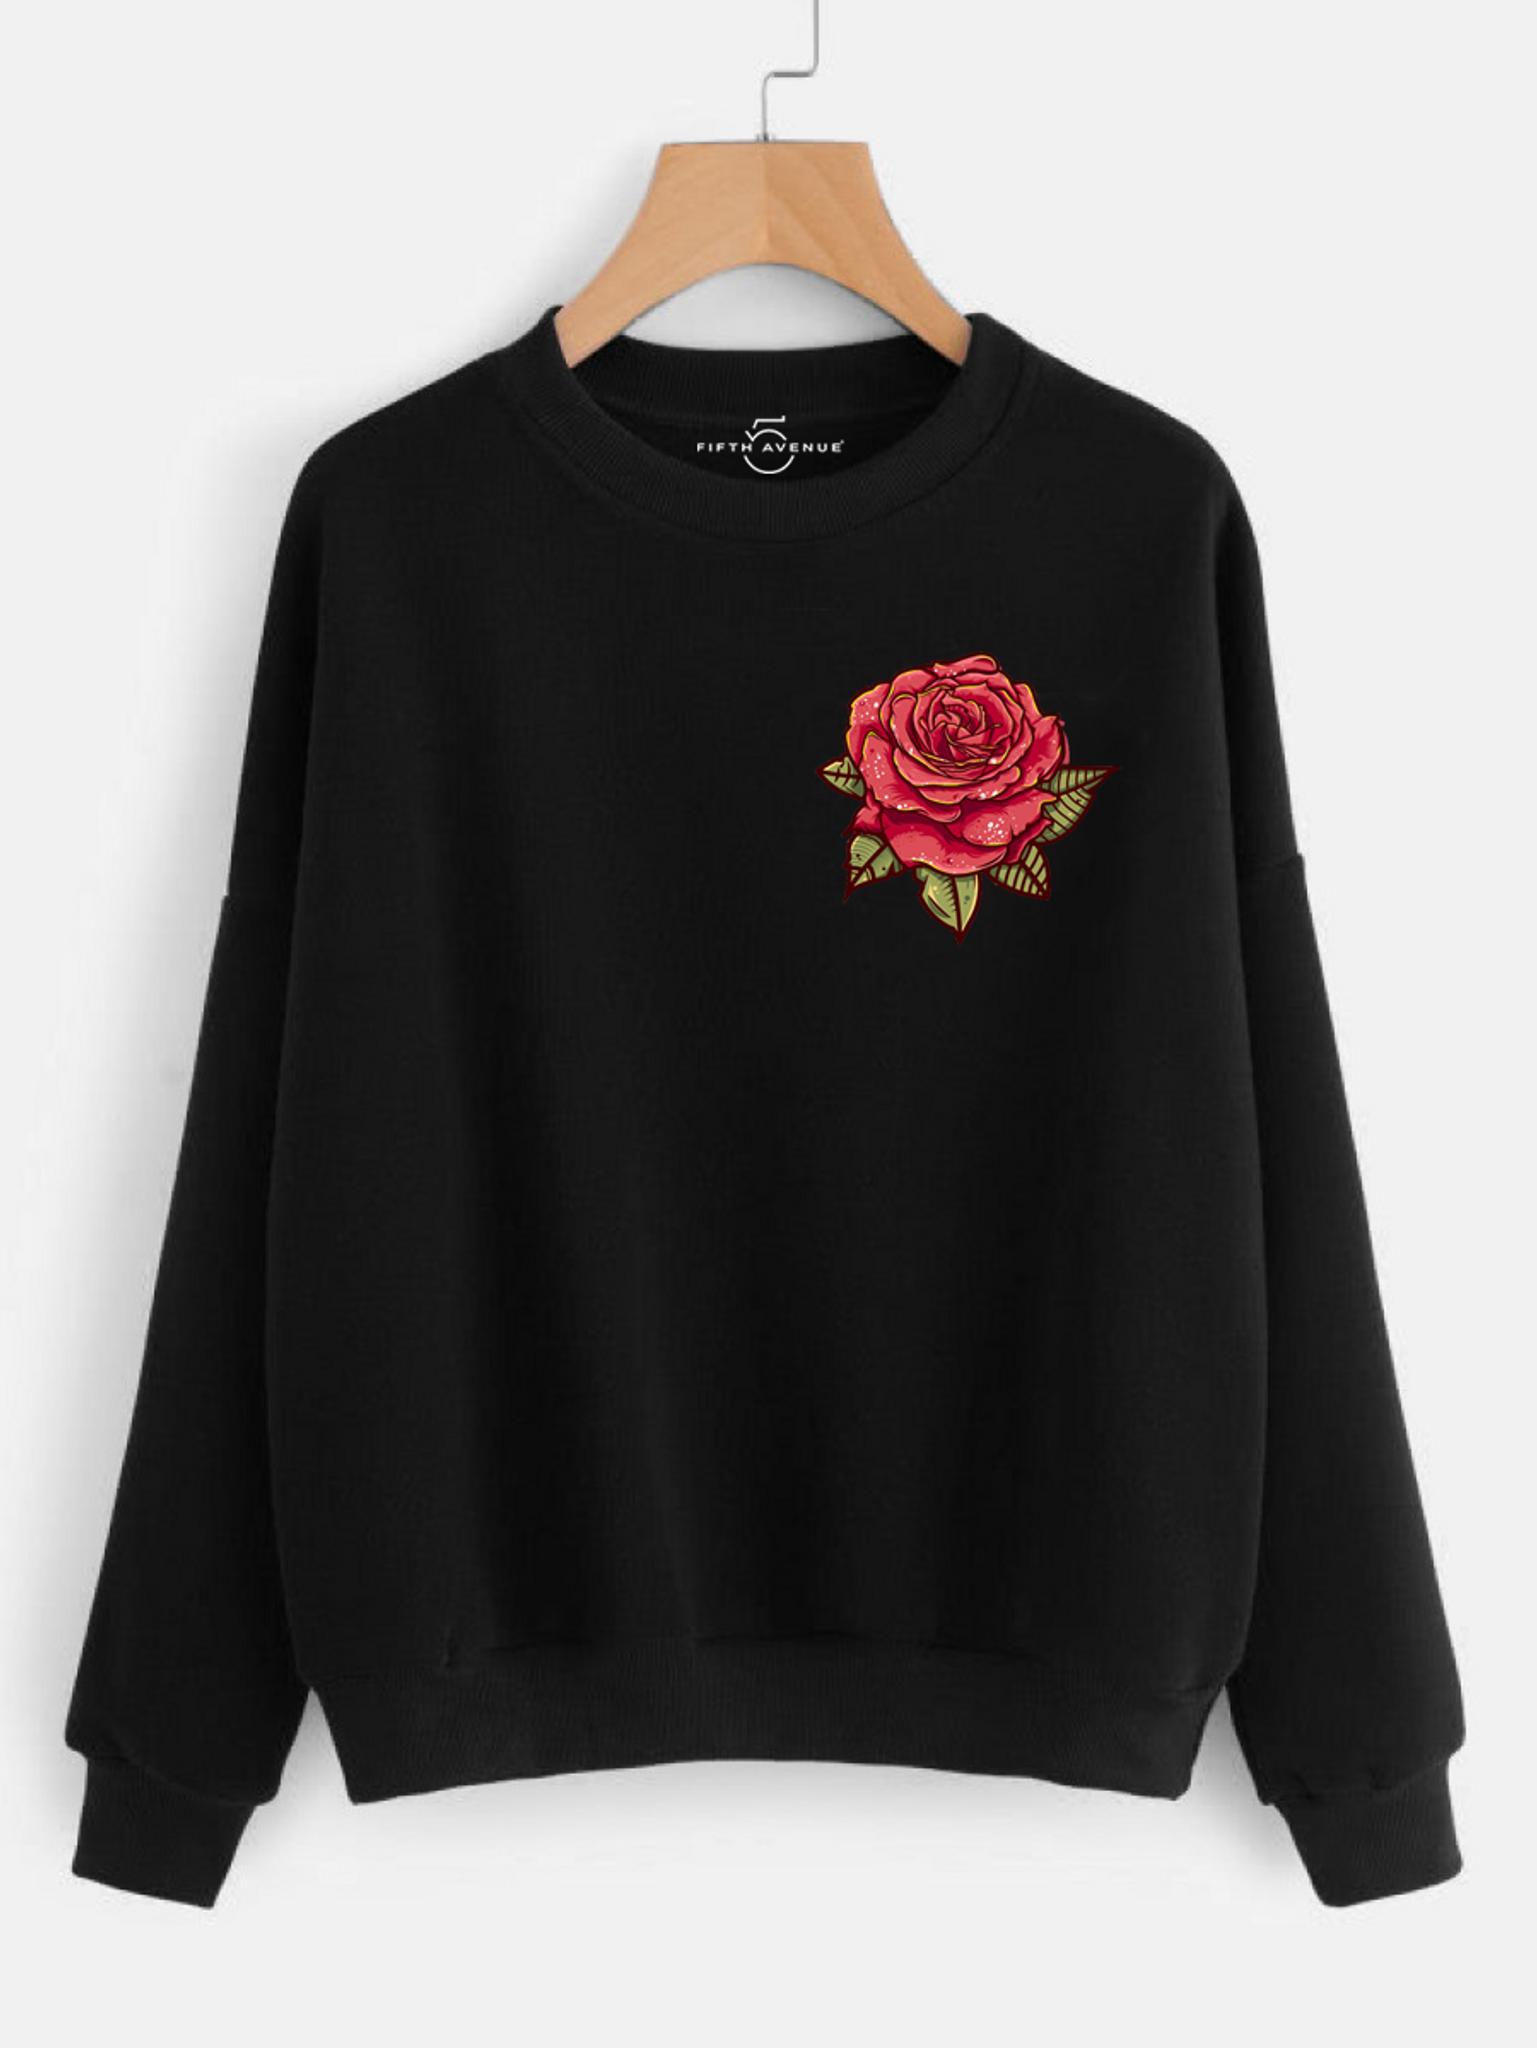 Fifth Avenue DIFT9 Pocket Rose Printed Sweatshirt - Black